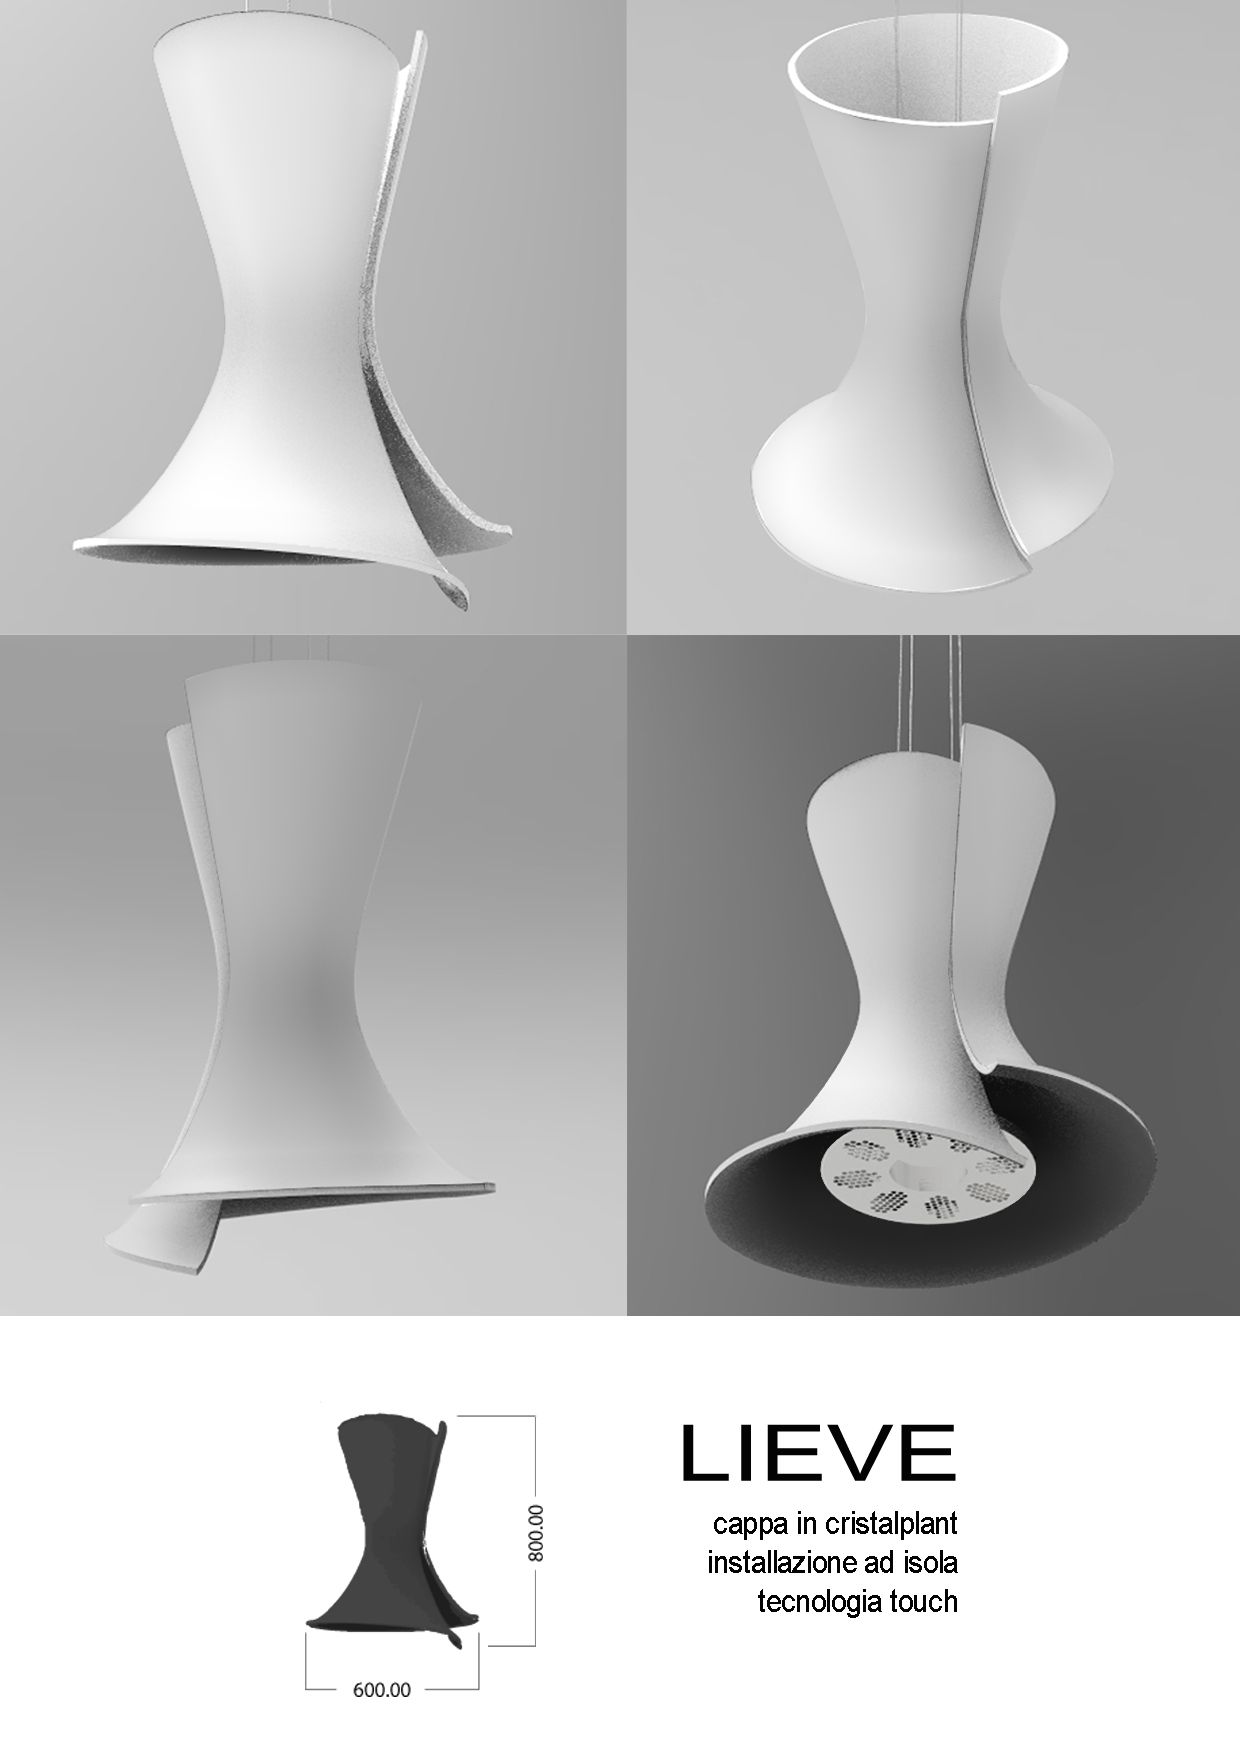 Concept for the Cristalplant Design Award